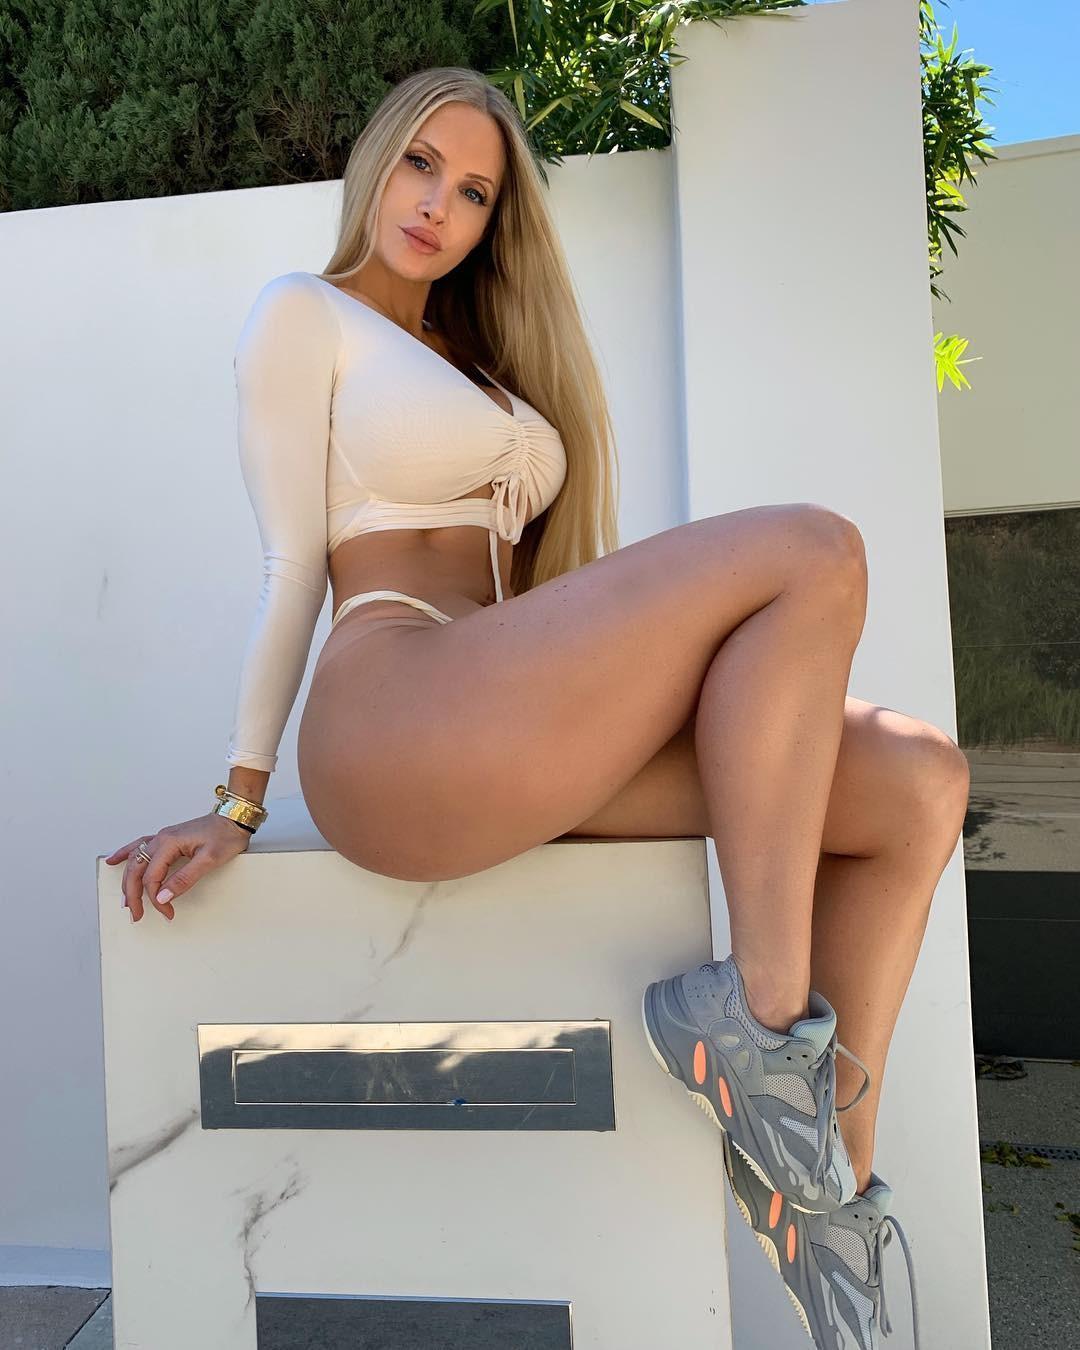 Amanda Elise Porn amanda elise lee nude naked pics and videos   free download